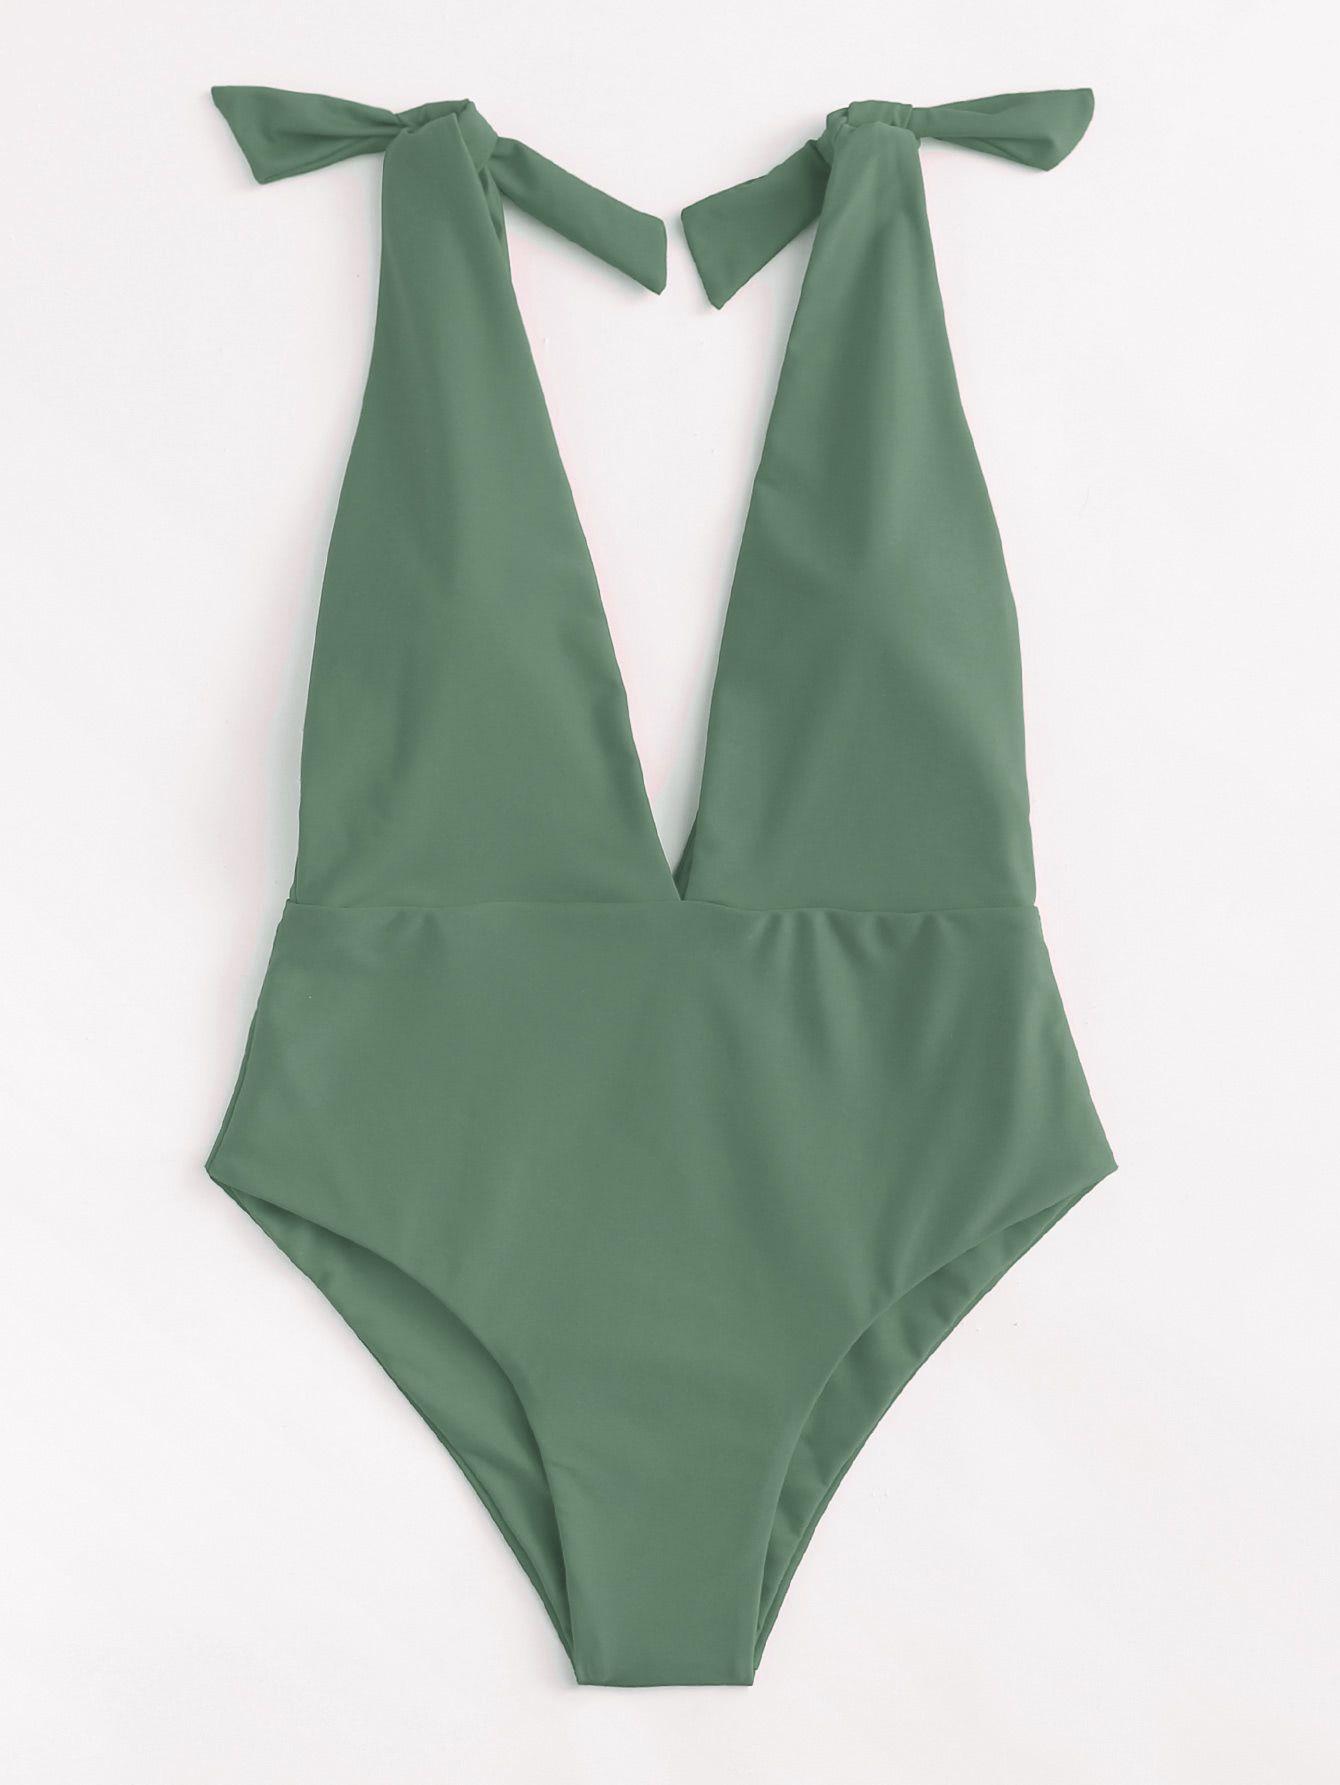 Y V Knot De Deep Plunge BañoTraje Baño SwimsuitPinterest Vestidos dthrxoCQsB